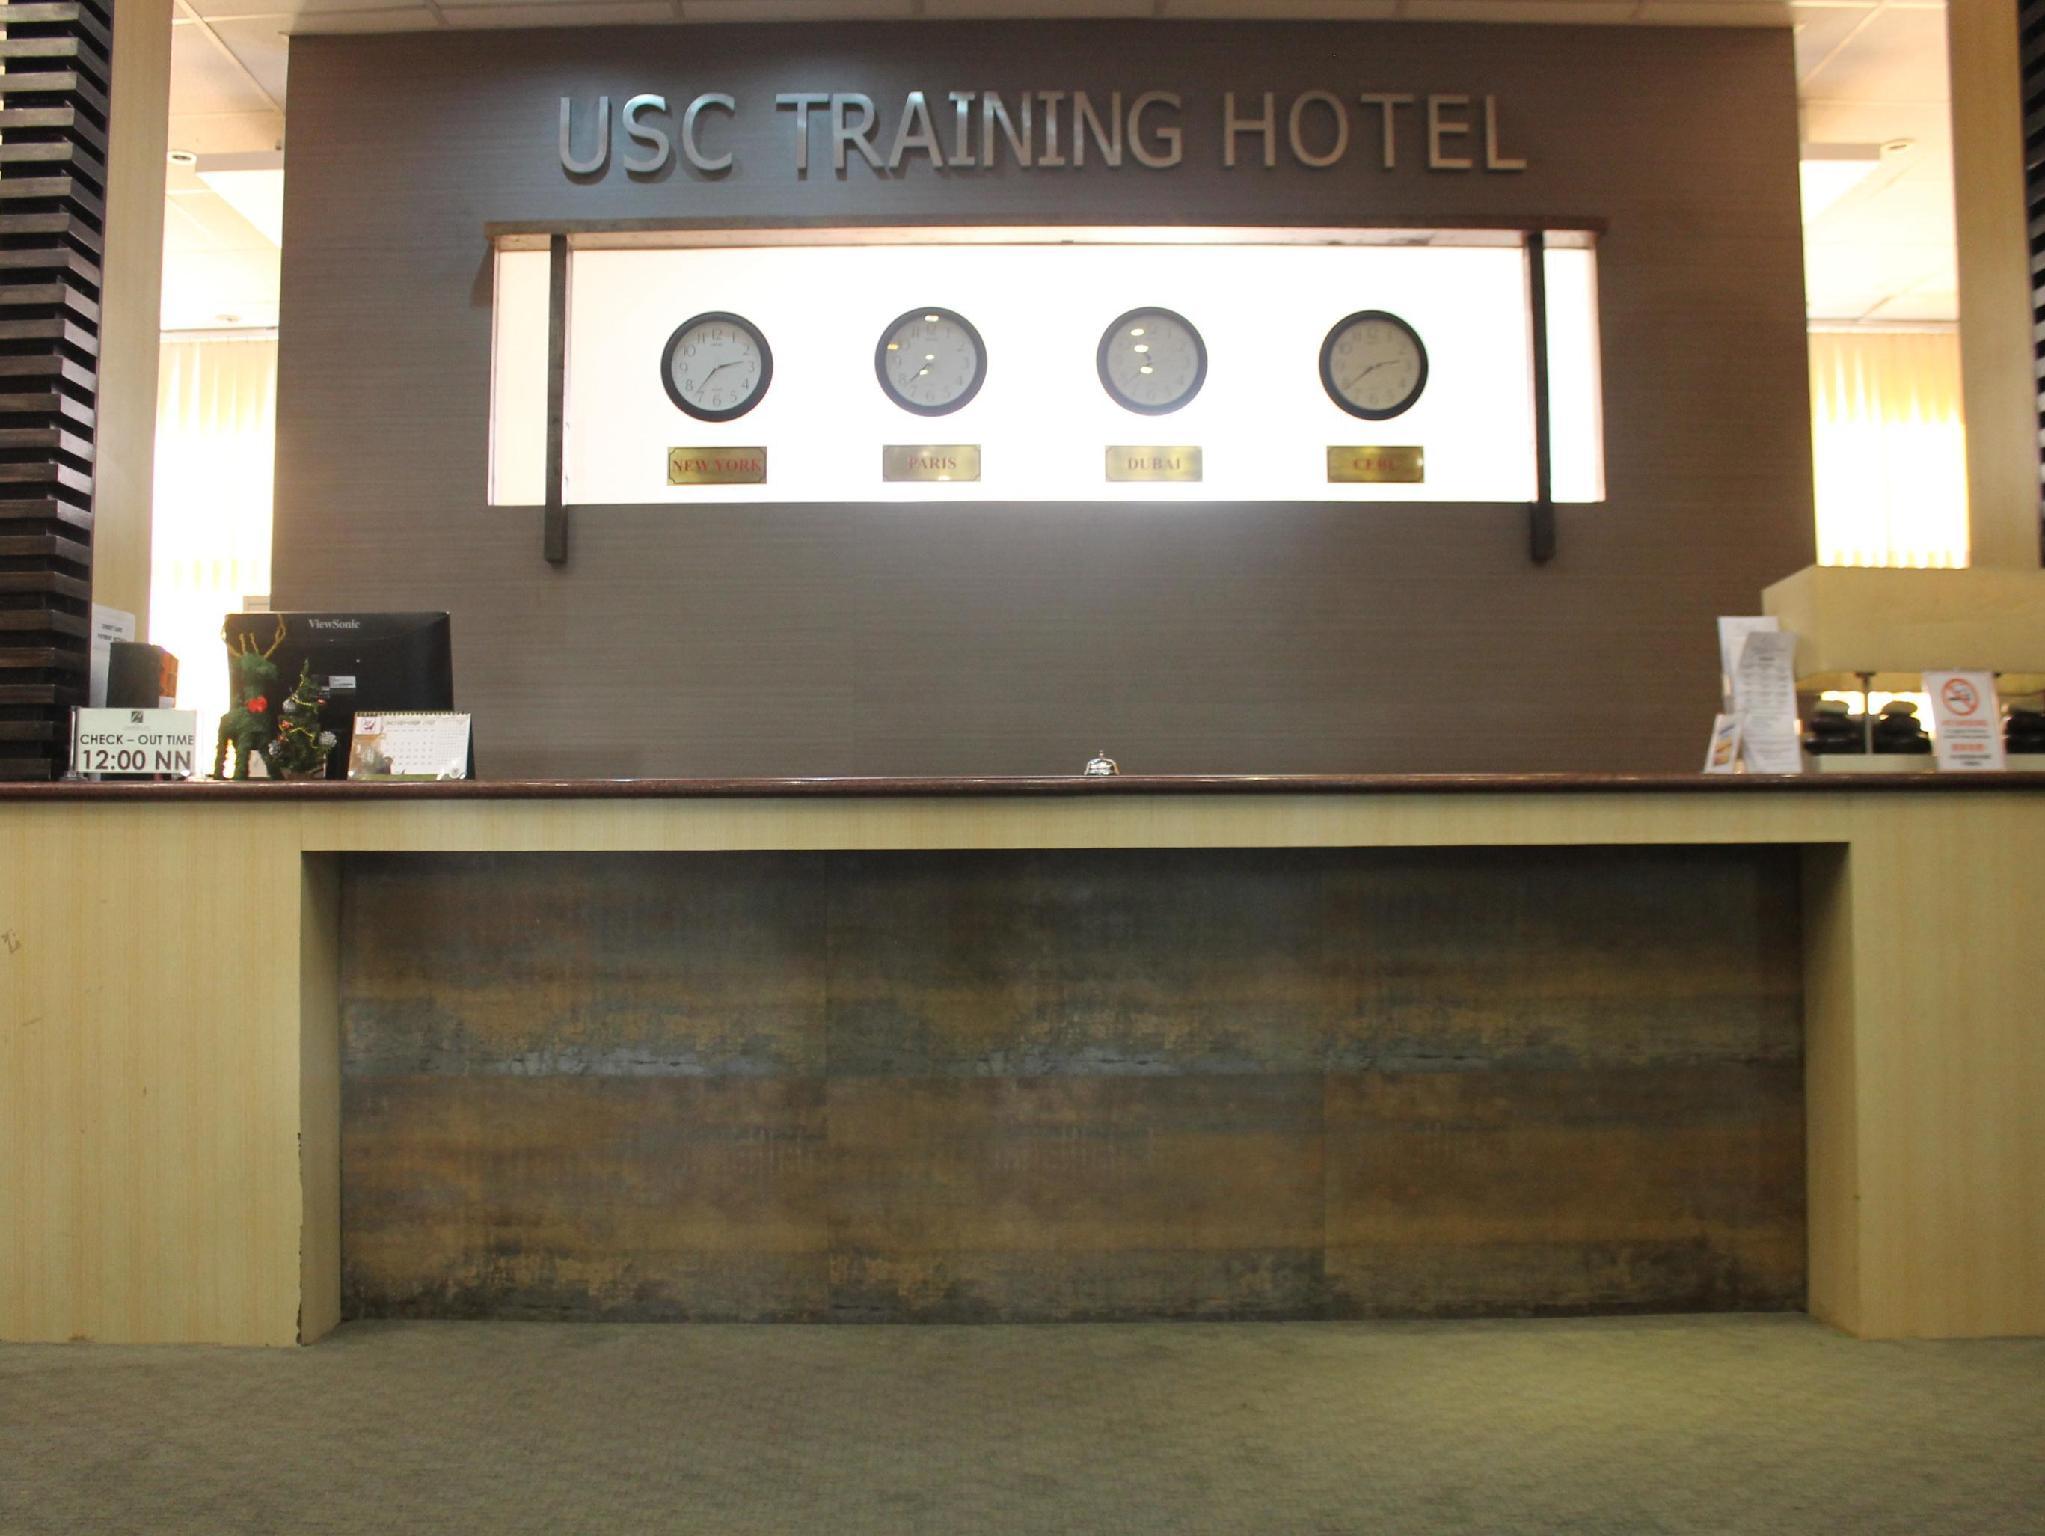 USC Training Hotel